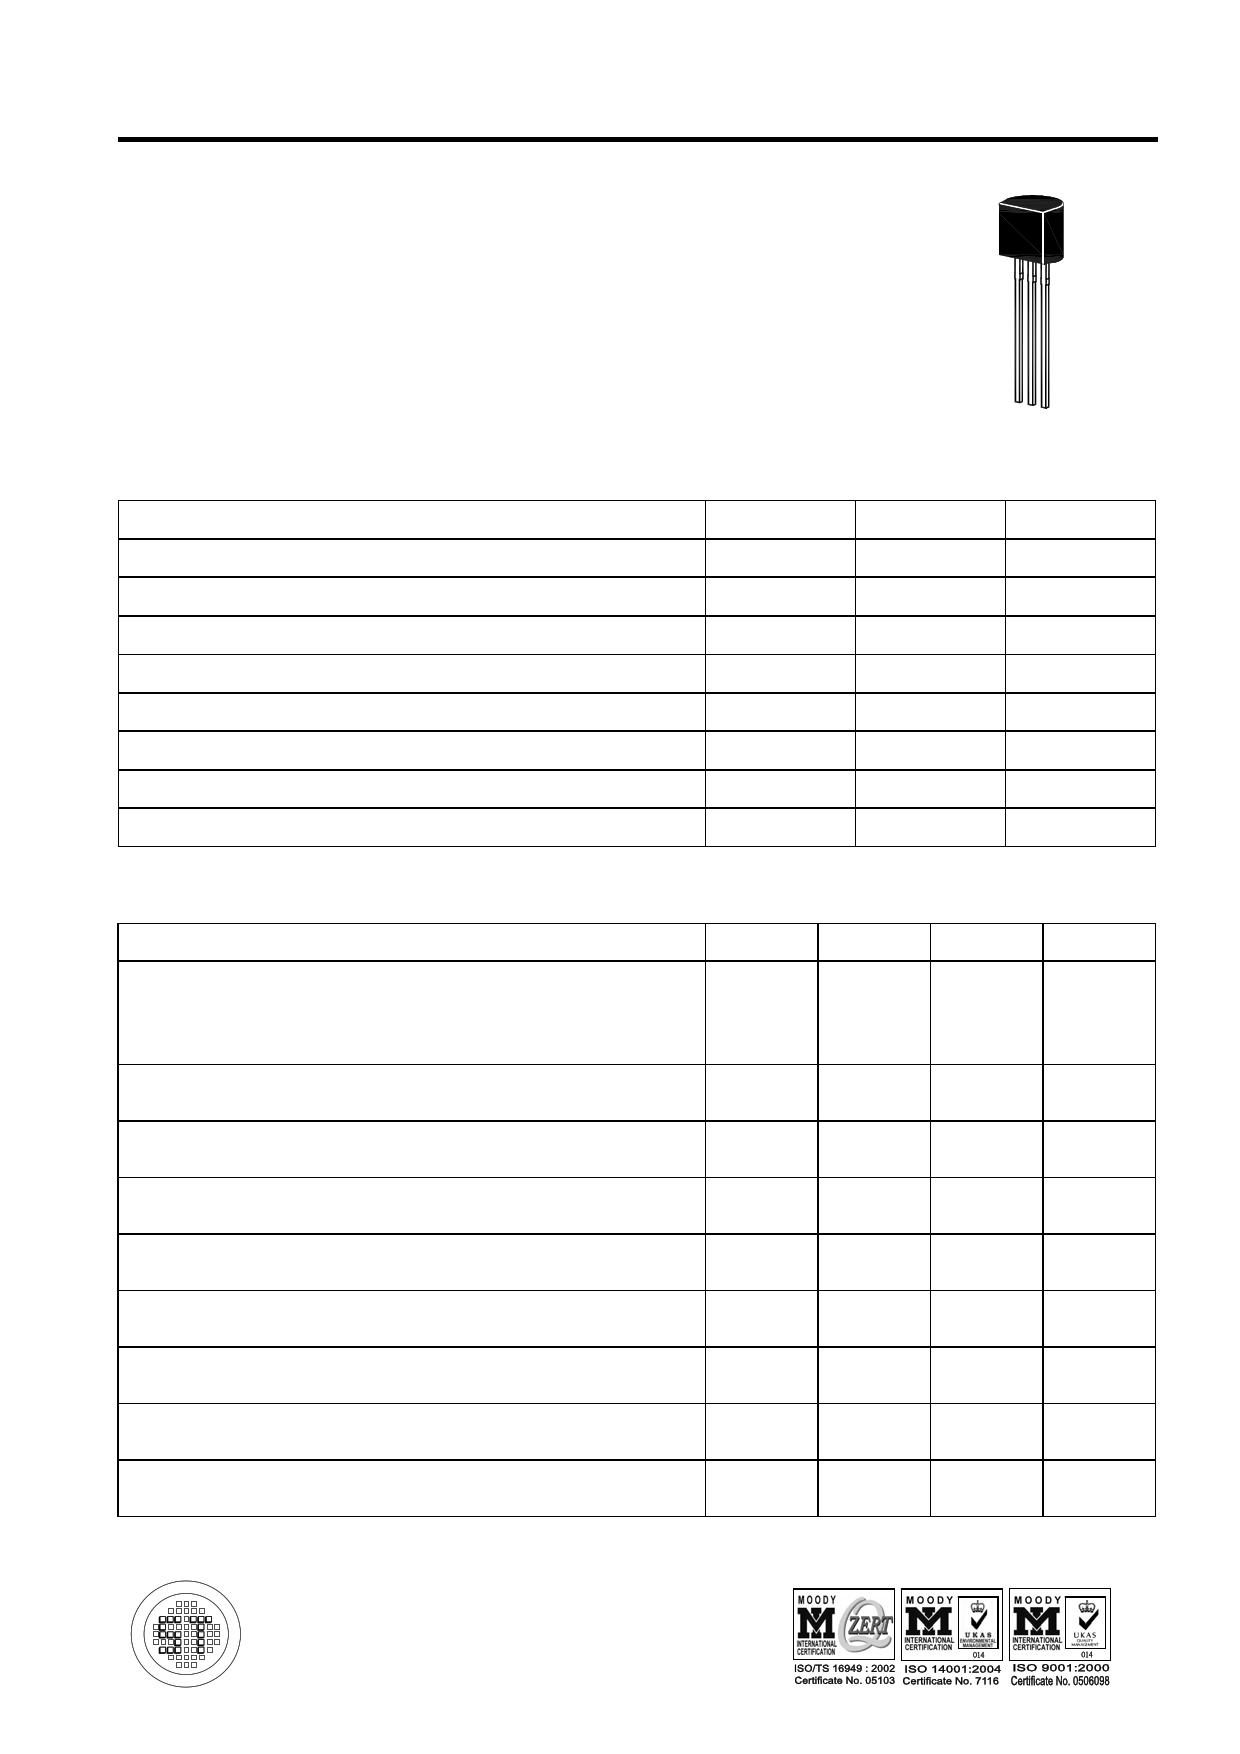 BC369 Datasheet